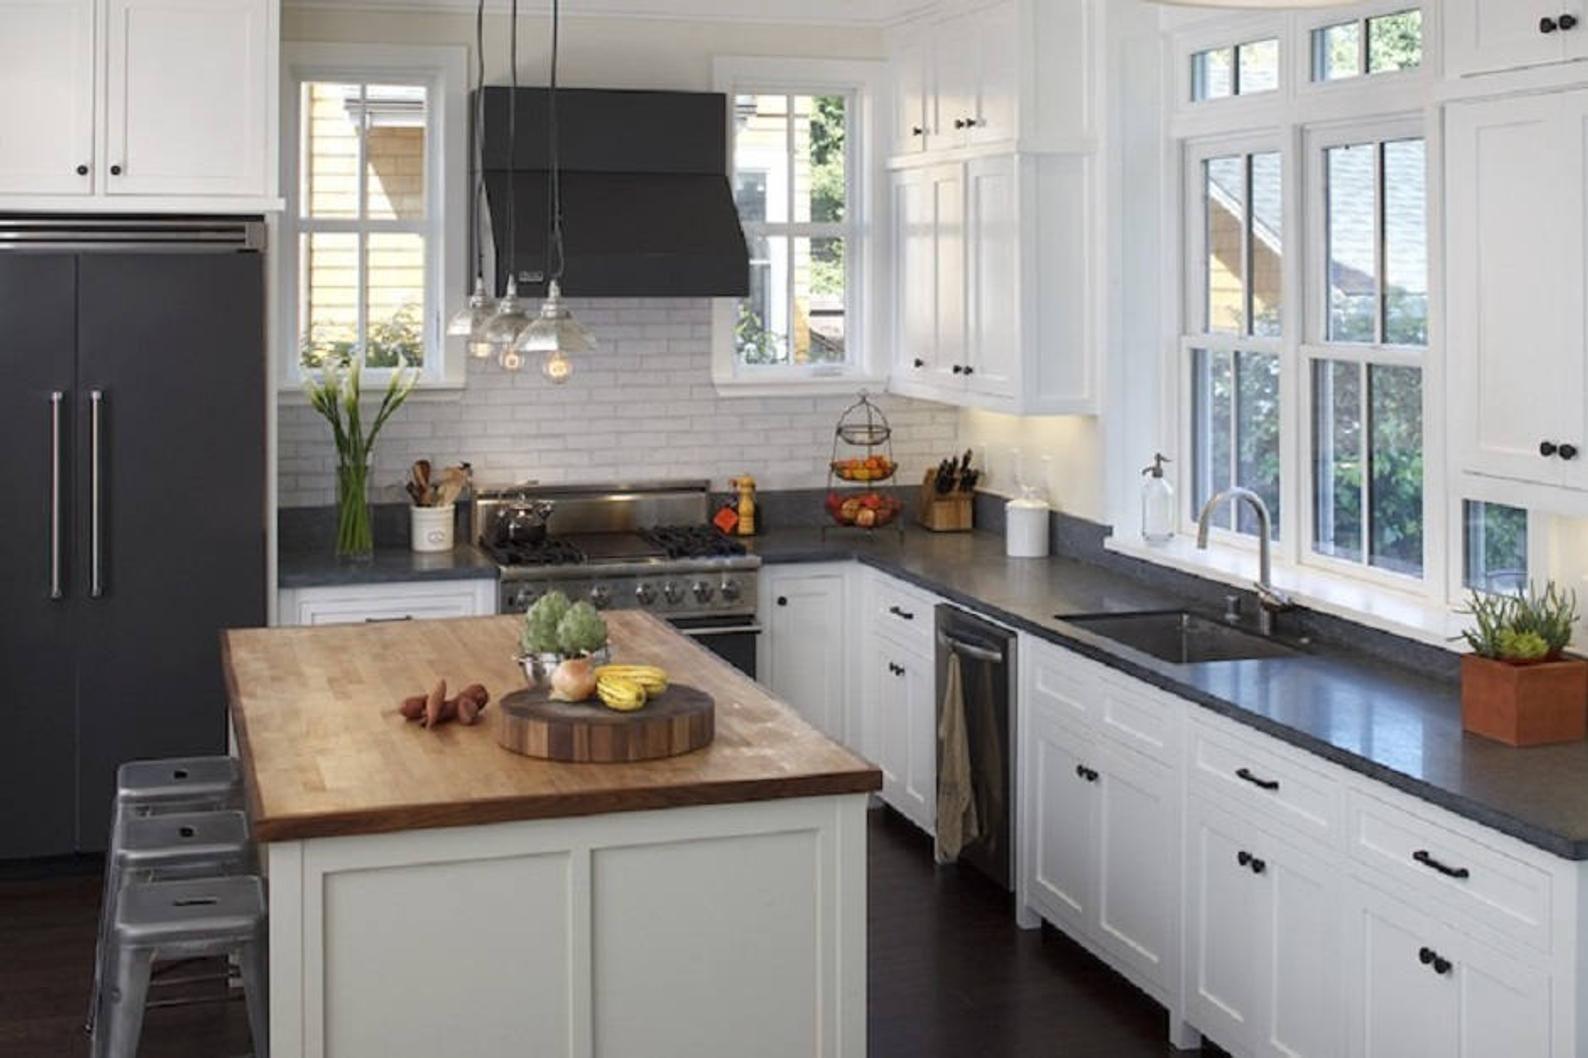 Ez Faux Decor Soapstone Matte Finish Dark Gray Self Adhesive Etsy In 2020 Kitchen Renovation Inspiration Kitchen Renovation Kitchen Inspirations